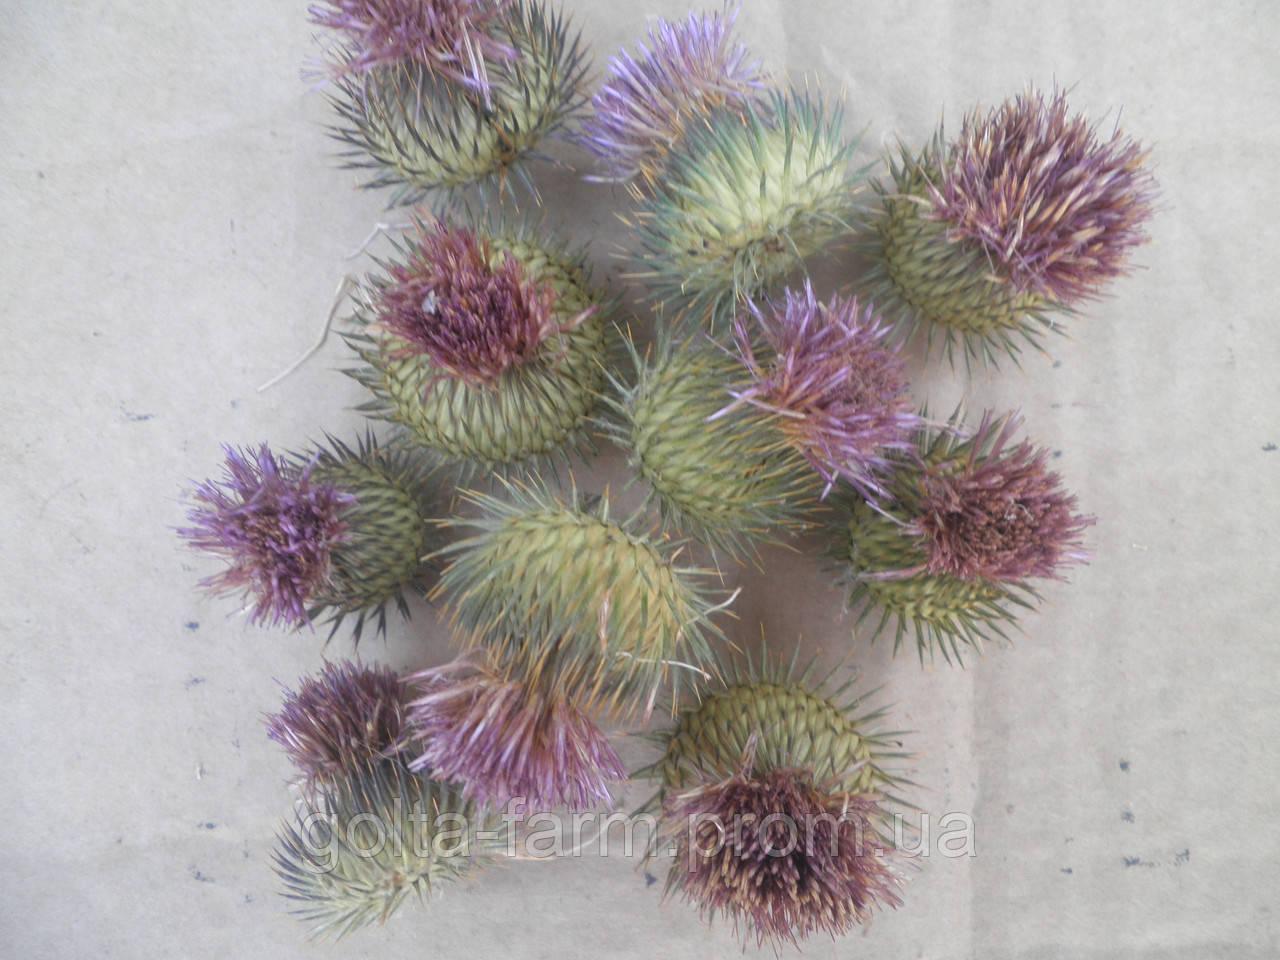 Татарник цветочные корзинки 50 грамм.